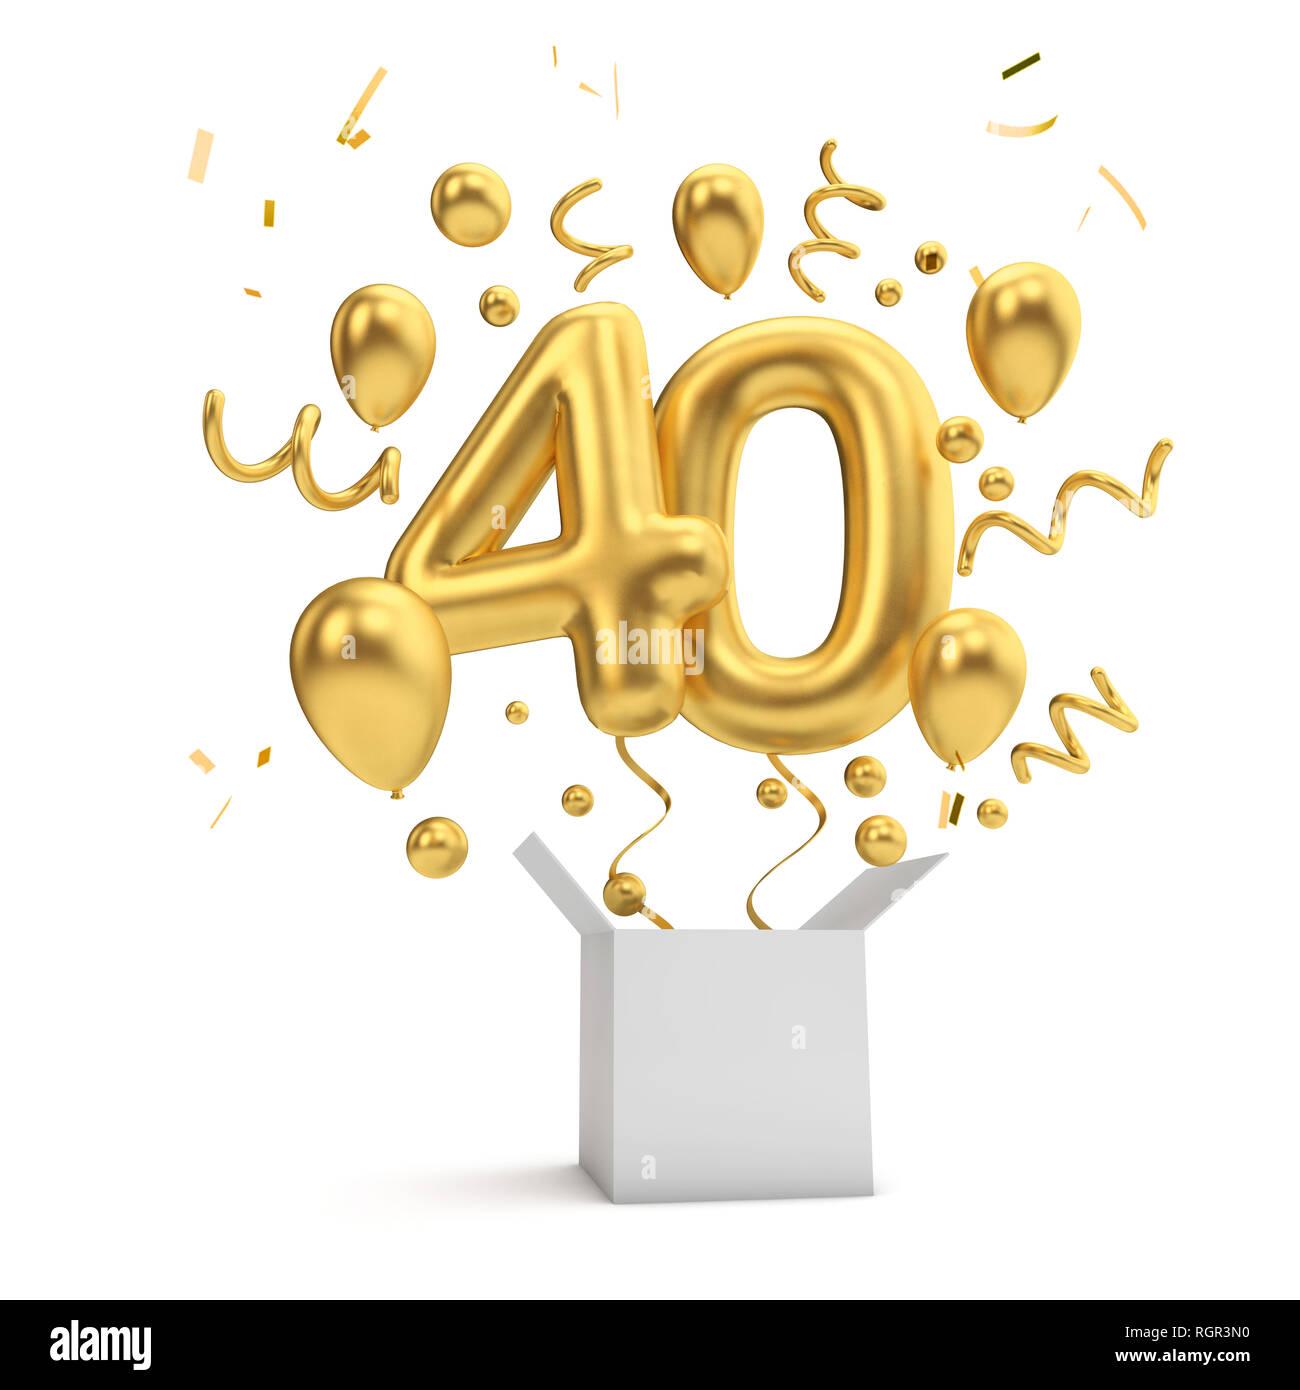 Happy 40th Birthday Gold Uberraschung Ballon Und Box 3D Rendering